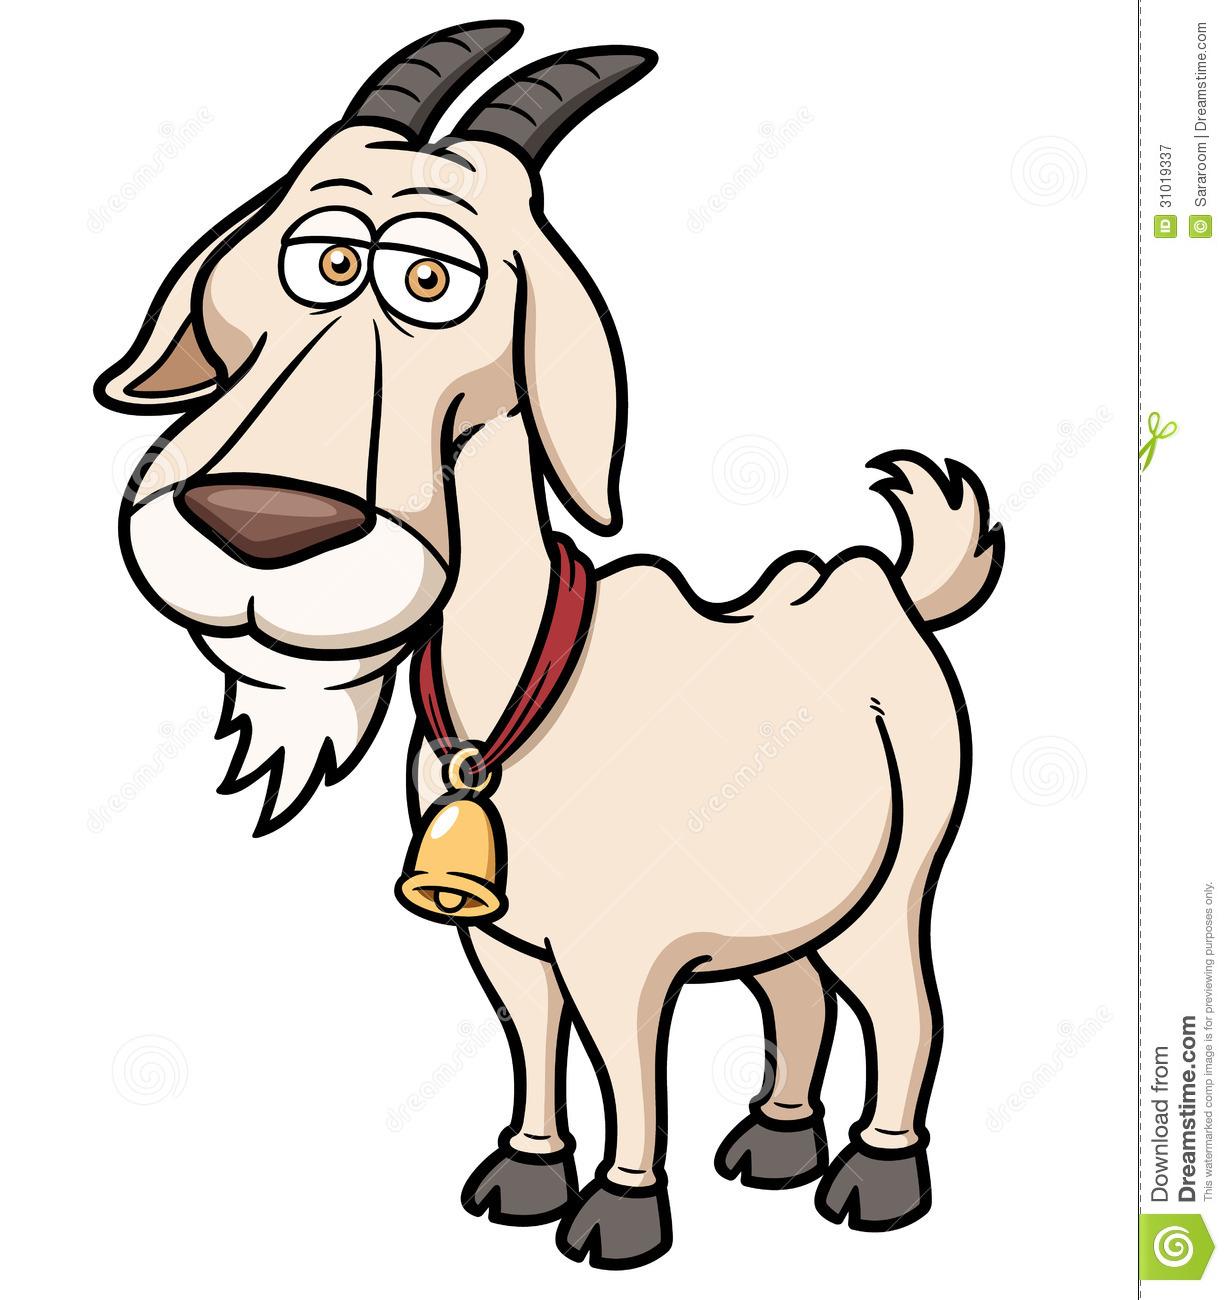 Cartoon Goat Clipart.